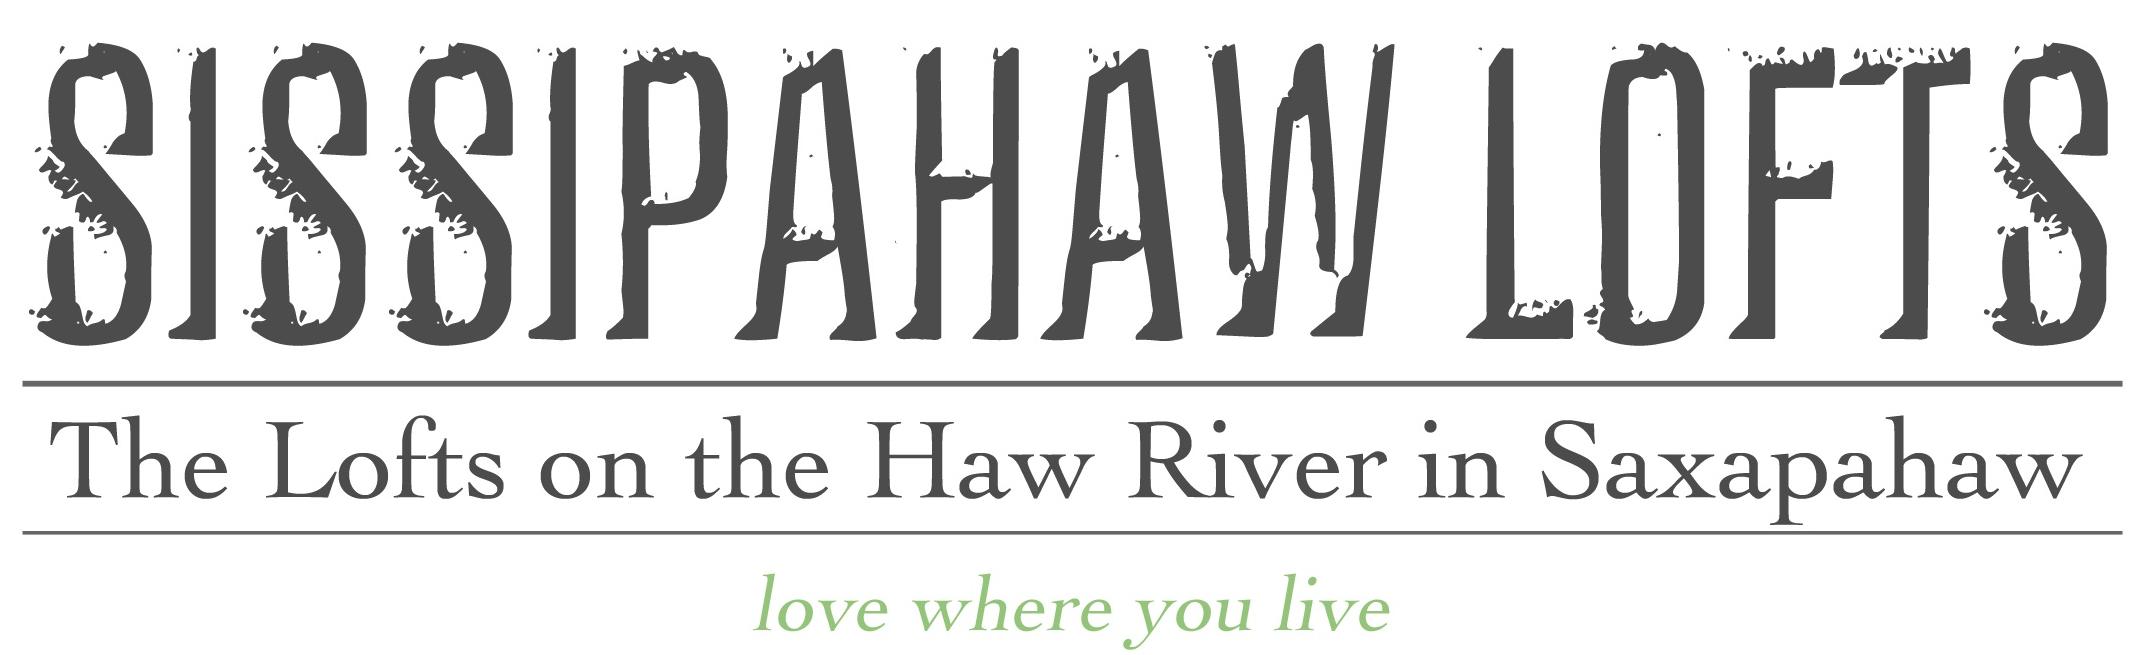 Sissipahaw Lofts logo_dark text_merged.png